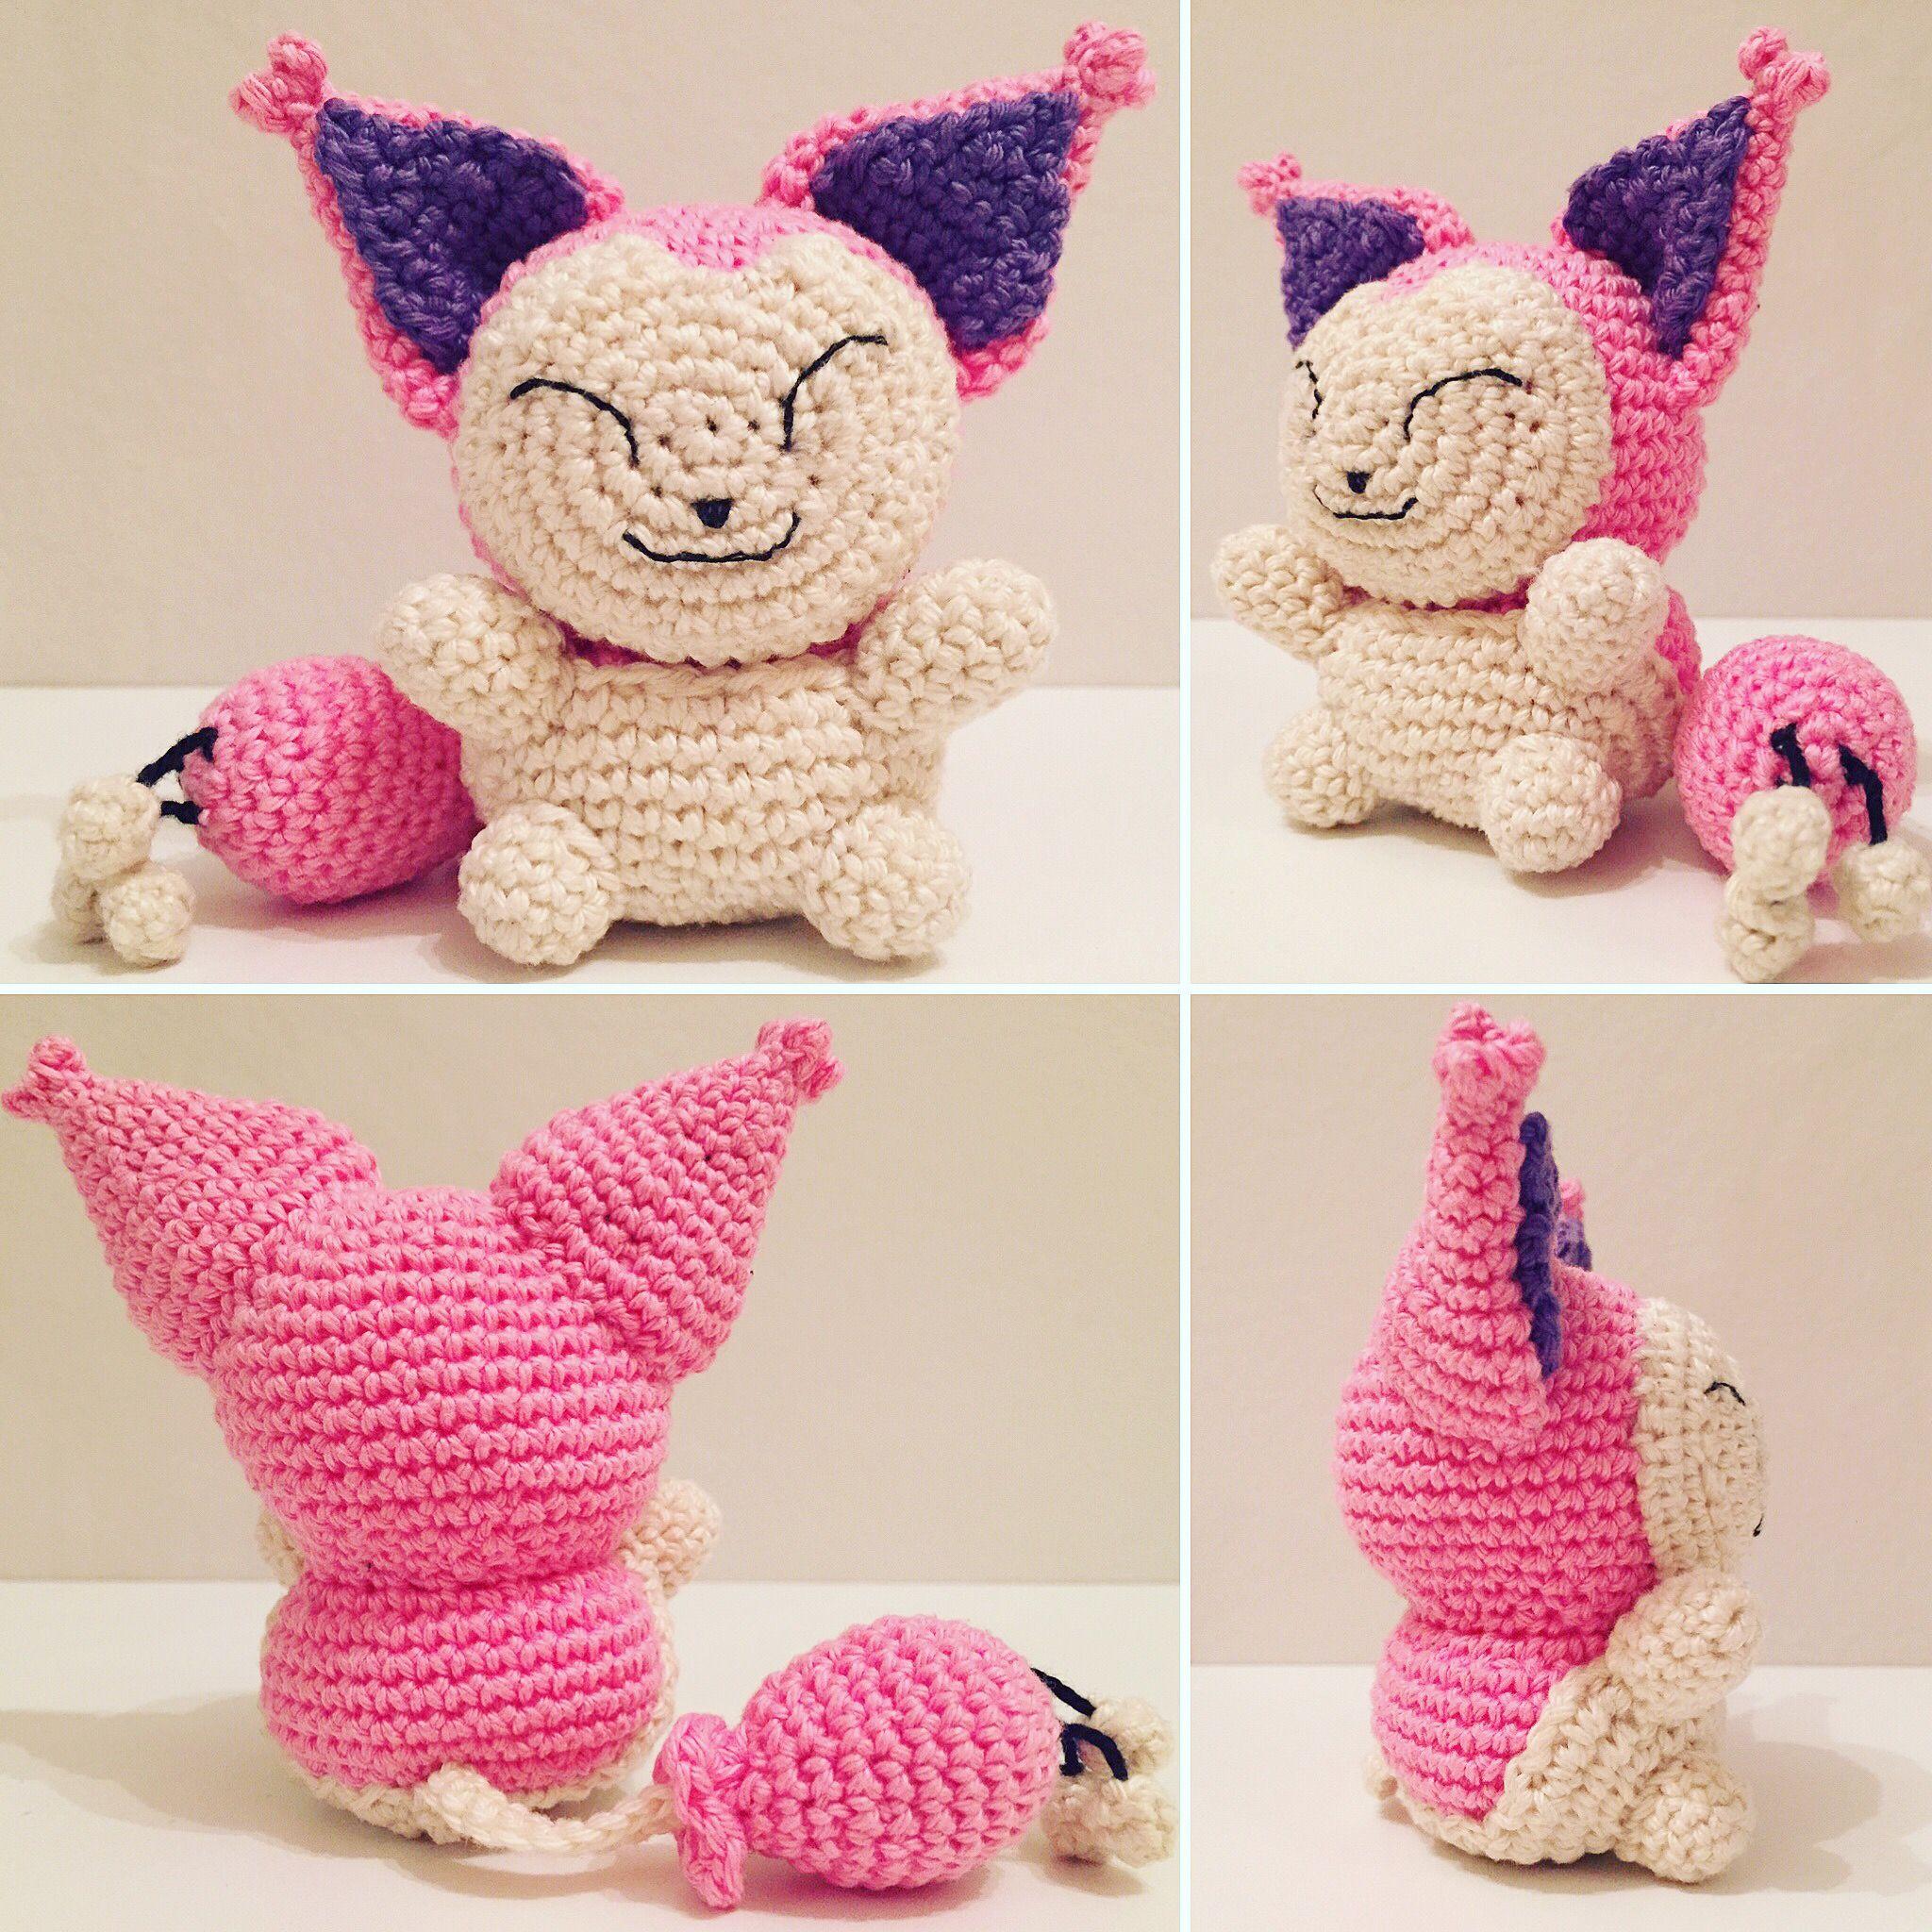 Pokemon Eneco / Skitty häkeln / crochet | crochet pokemon ...